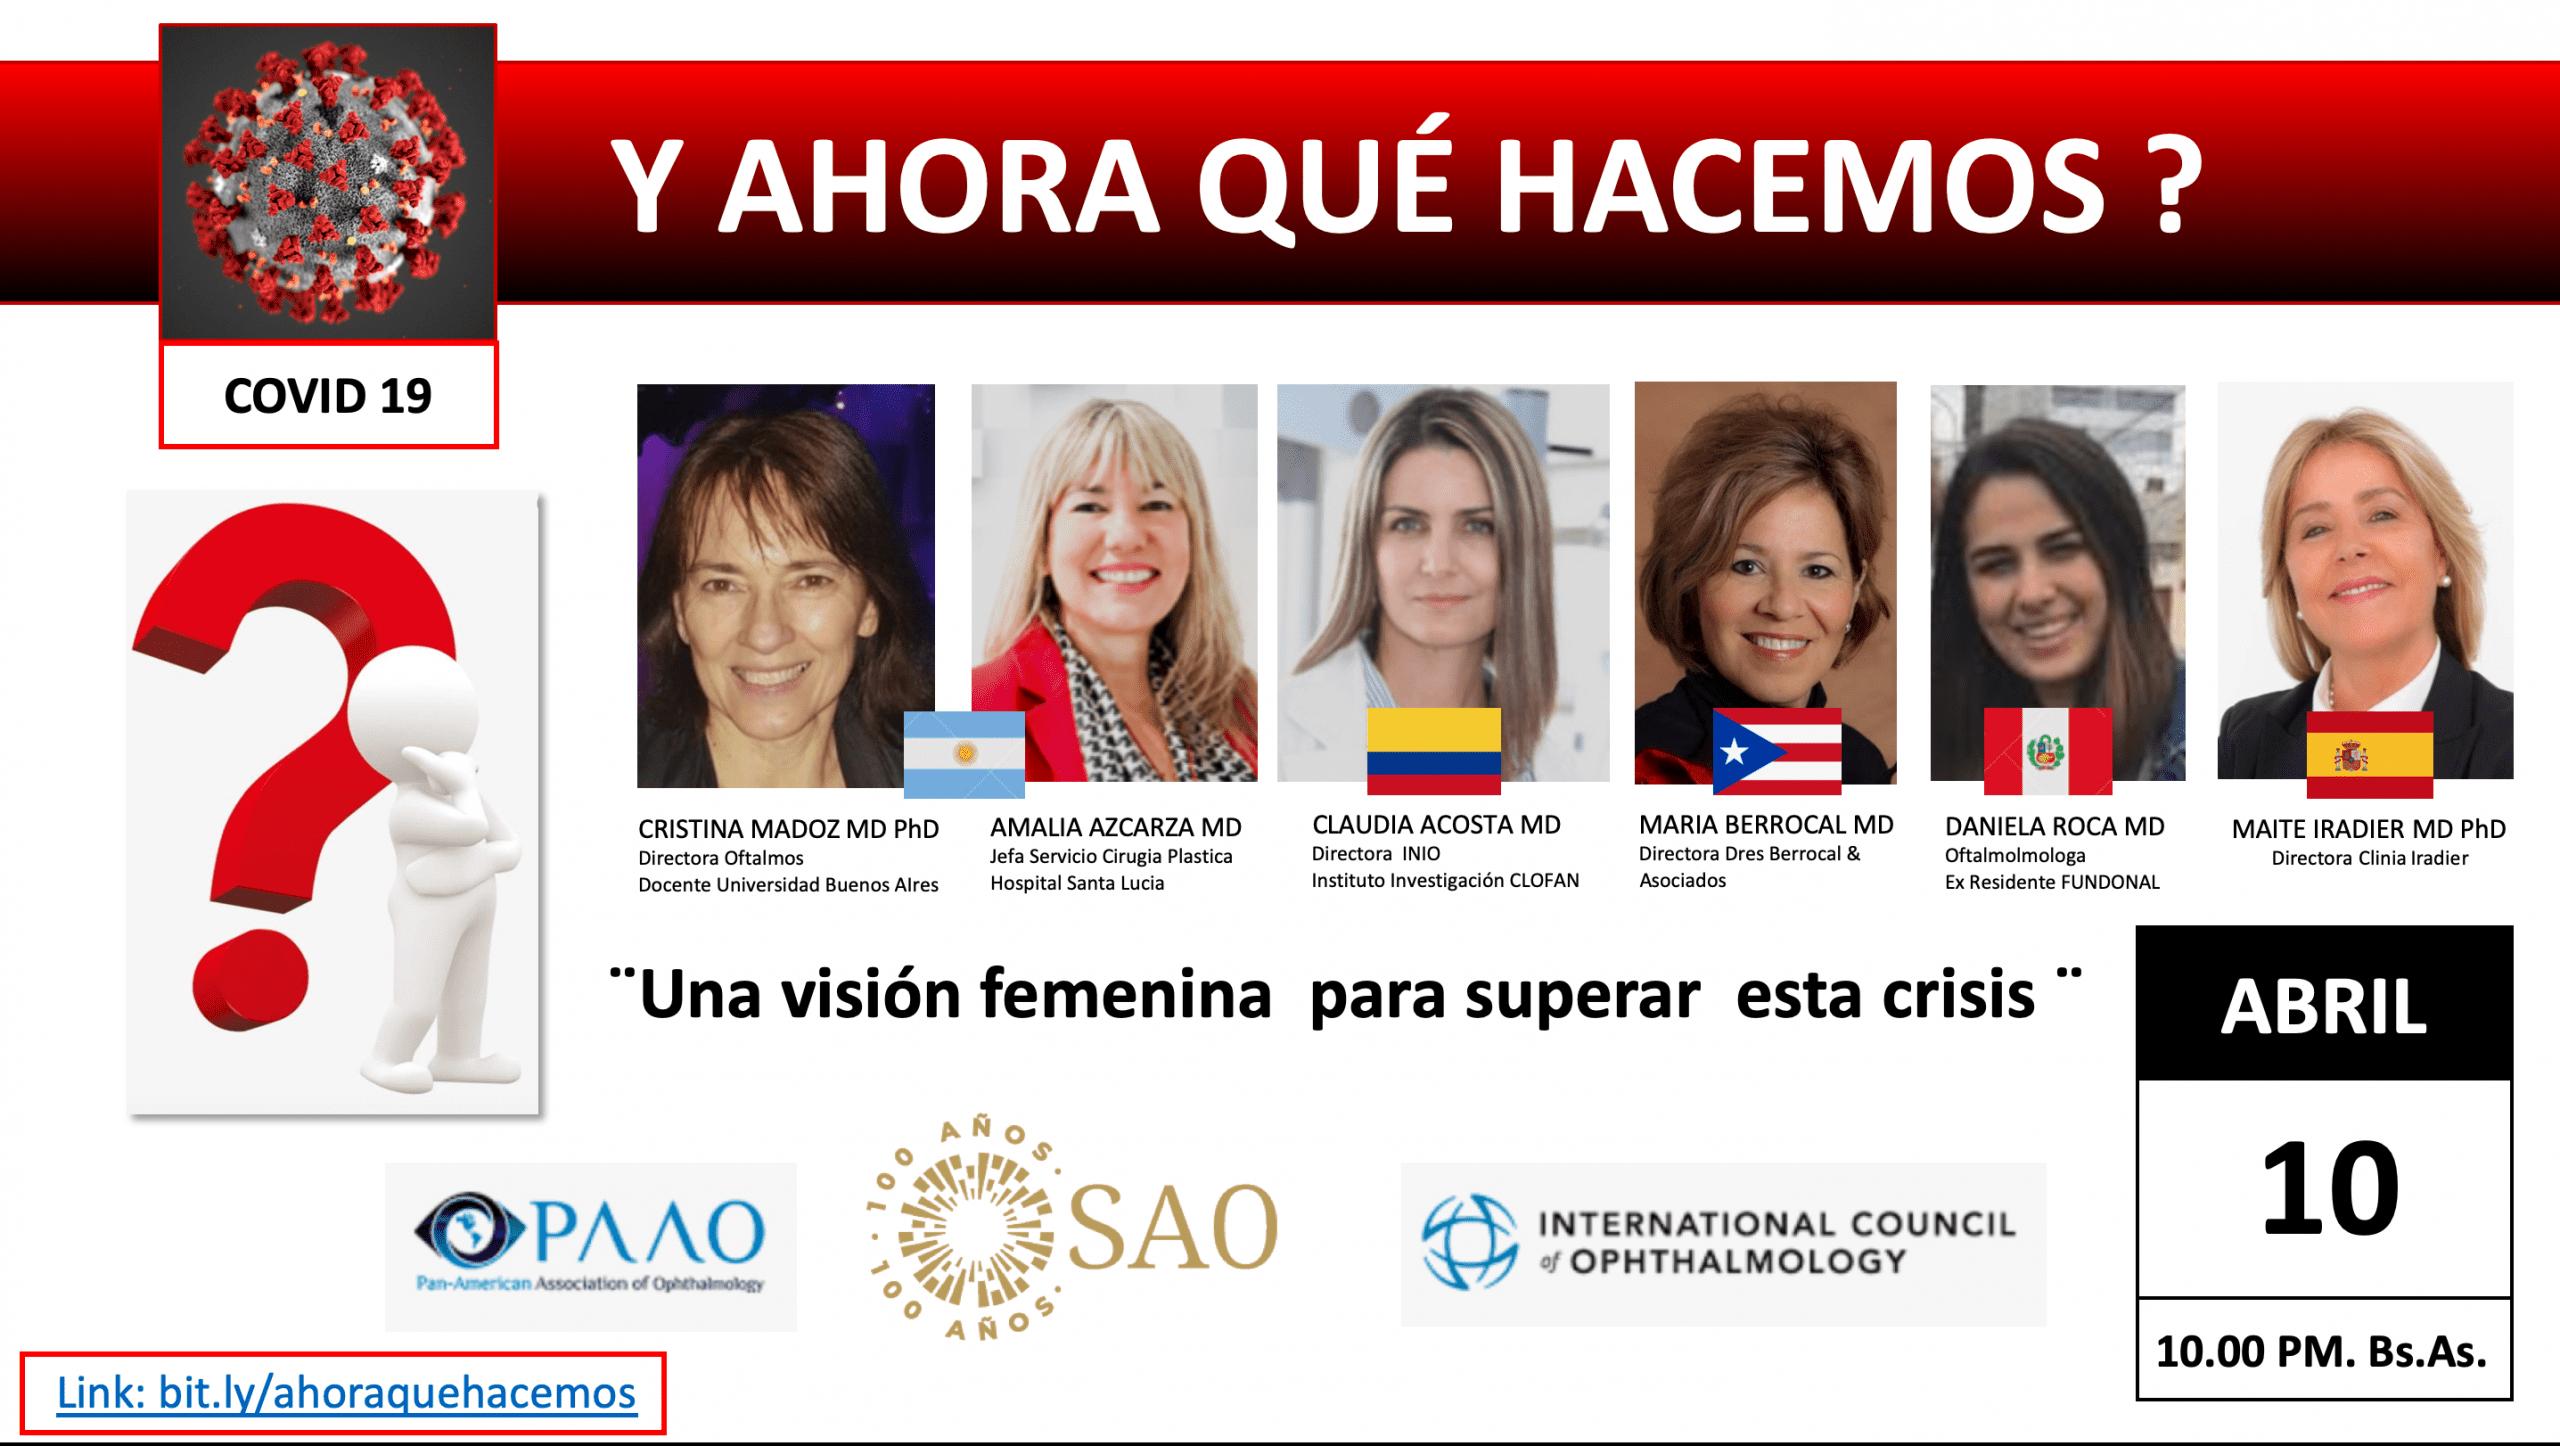 Panel: Una vision femenina para superar esta crisis